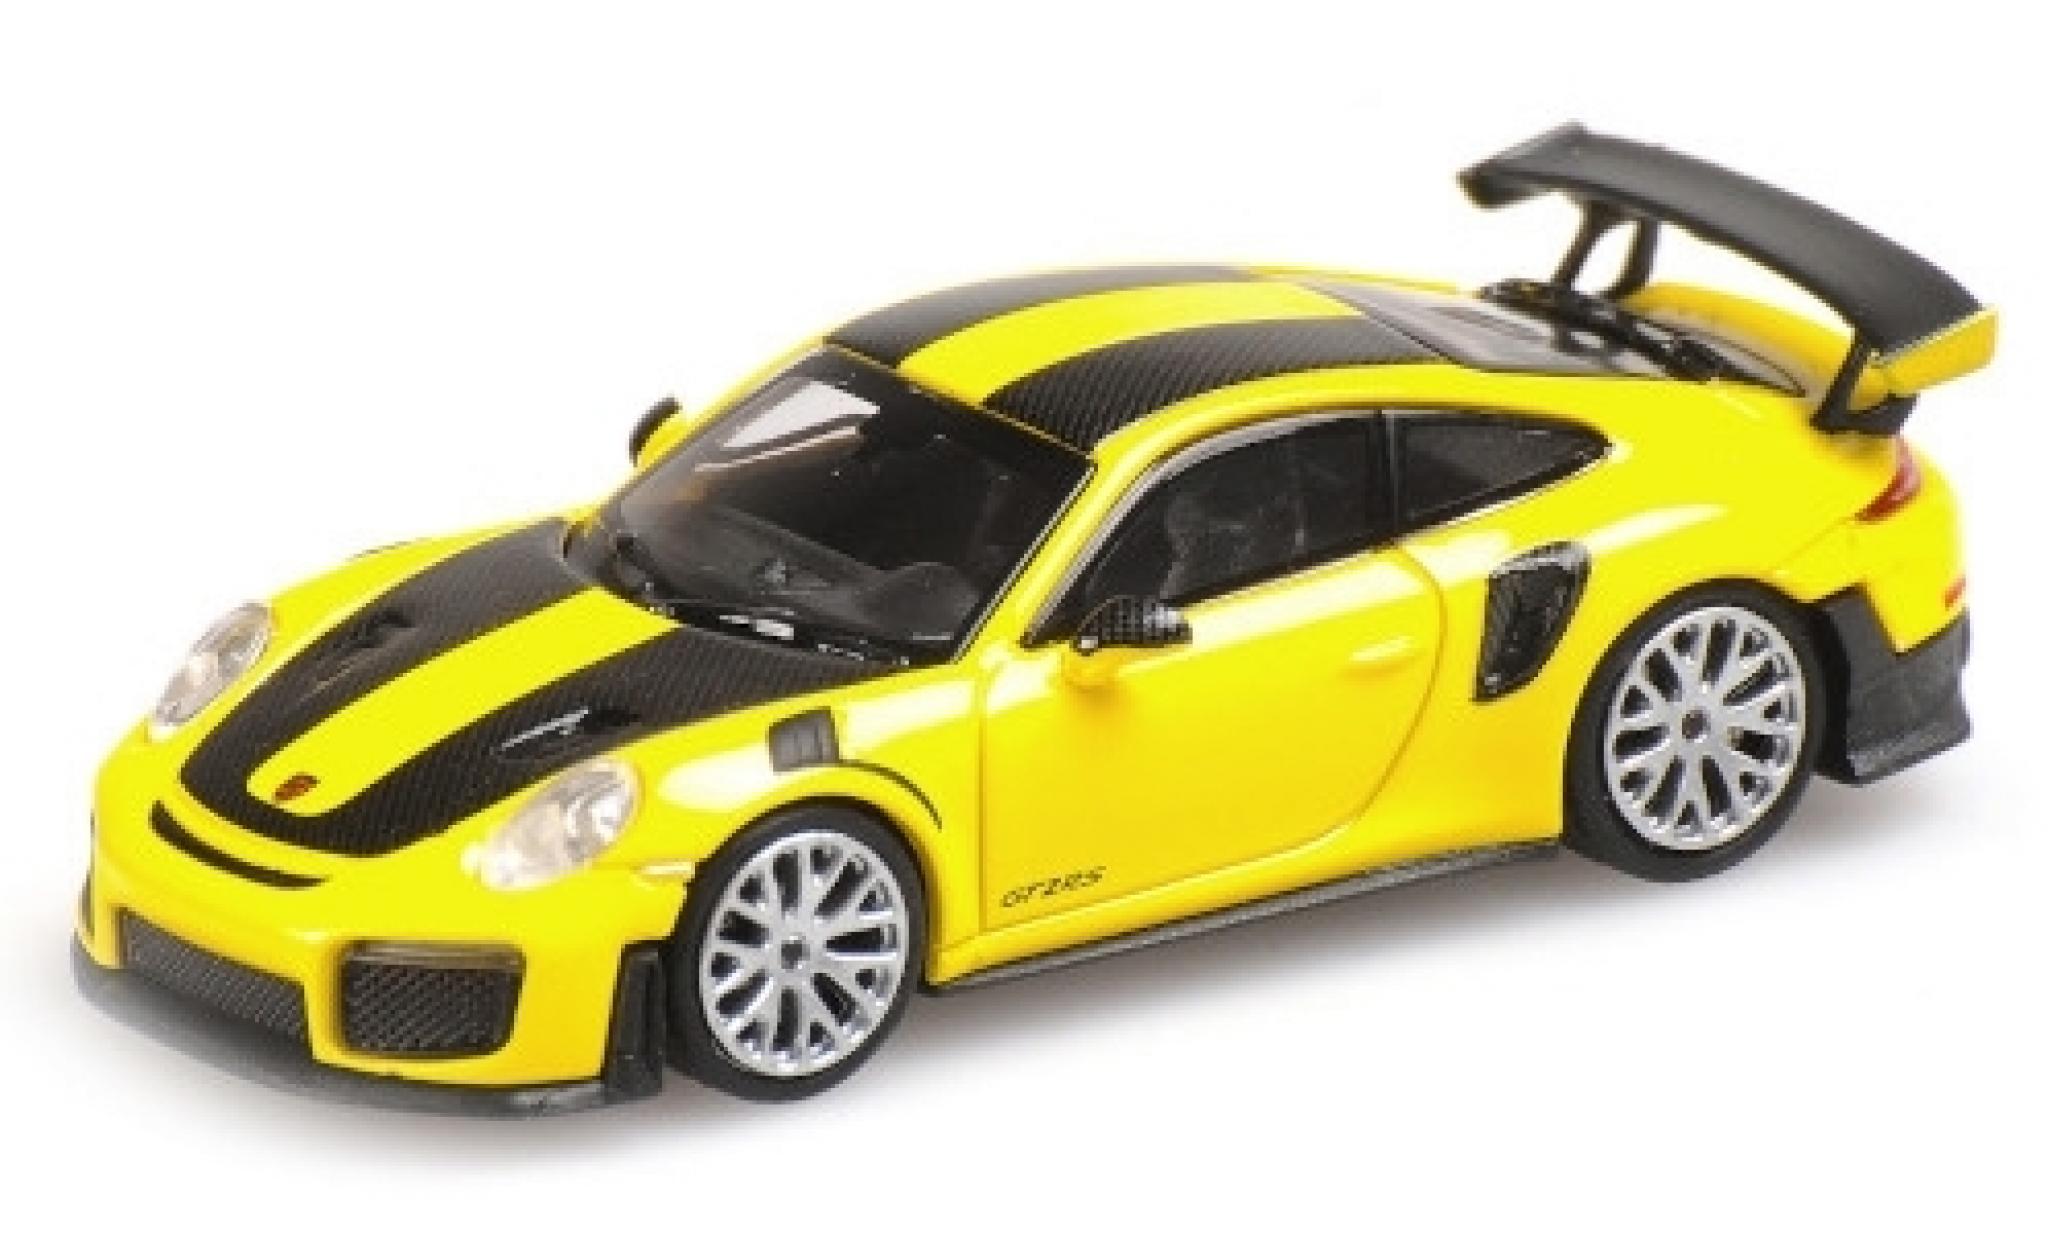 Porsche 991 GT2 RS 1/87 Minichamps 911 yellow 2018 avec Carbon-Streifen